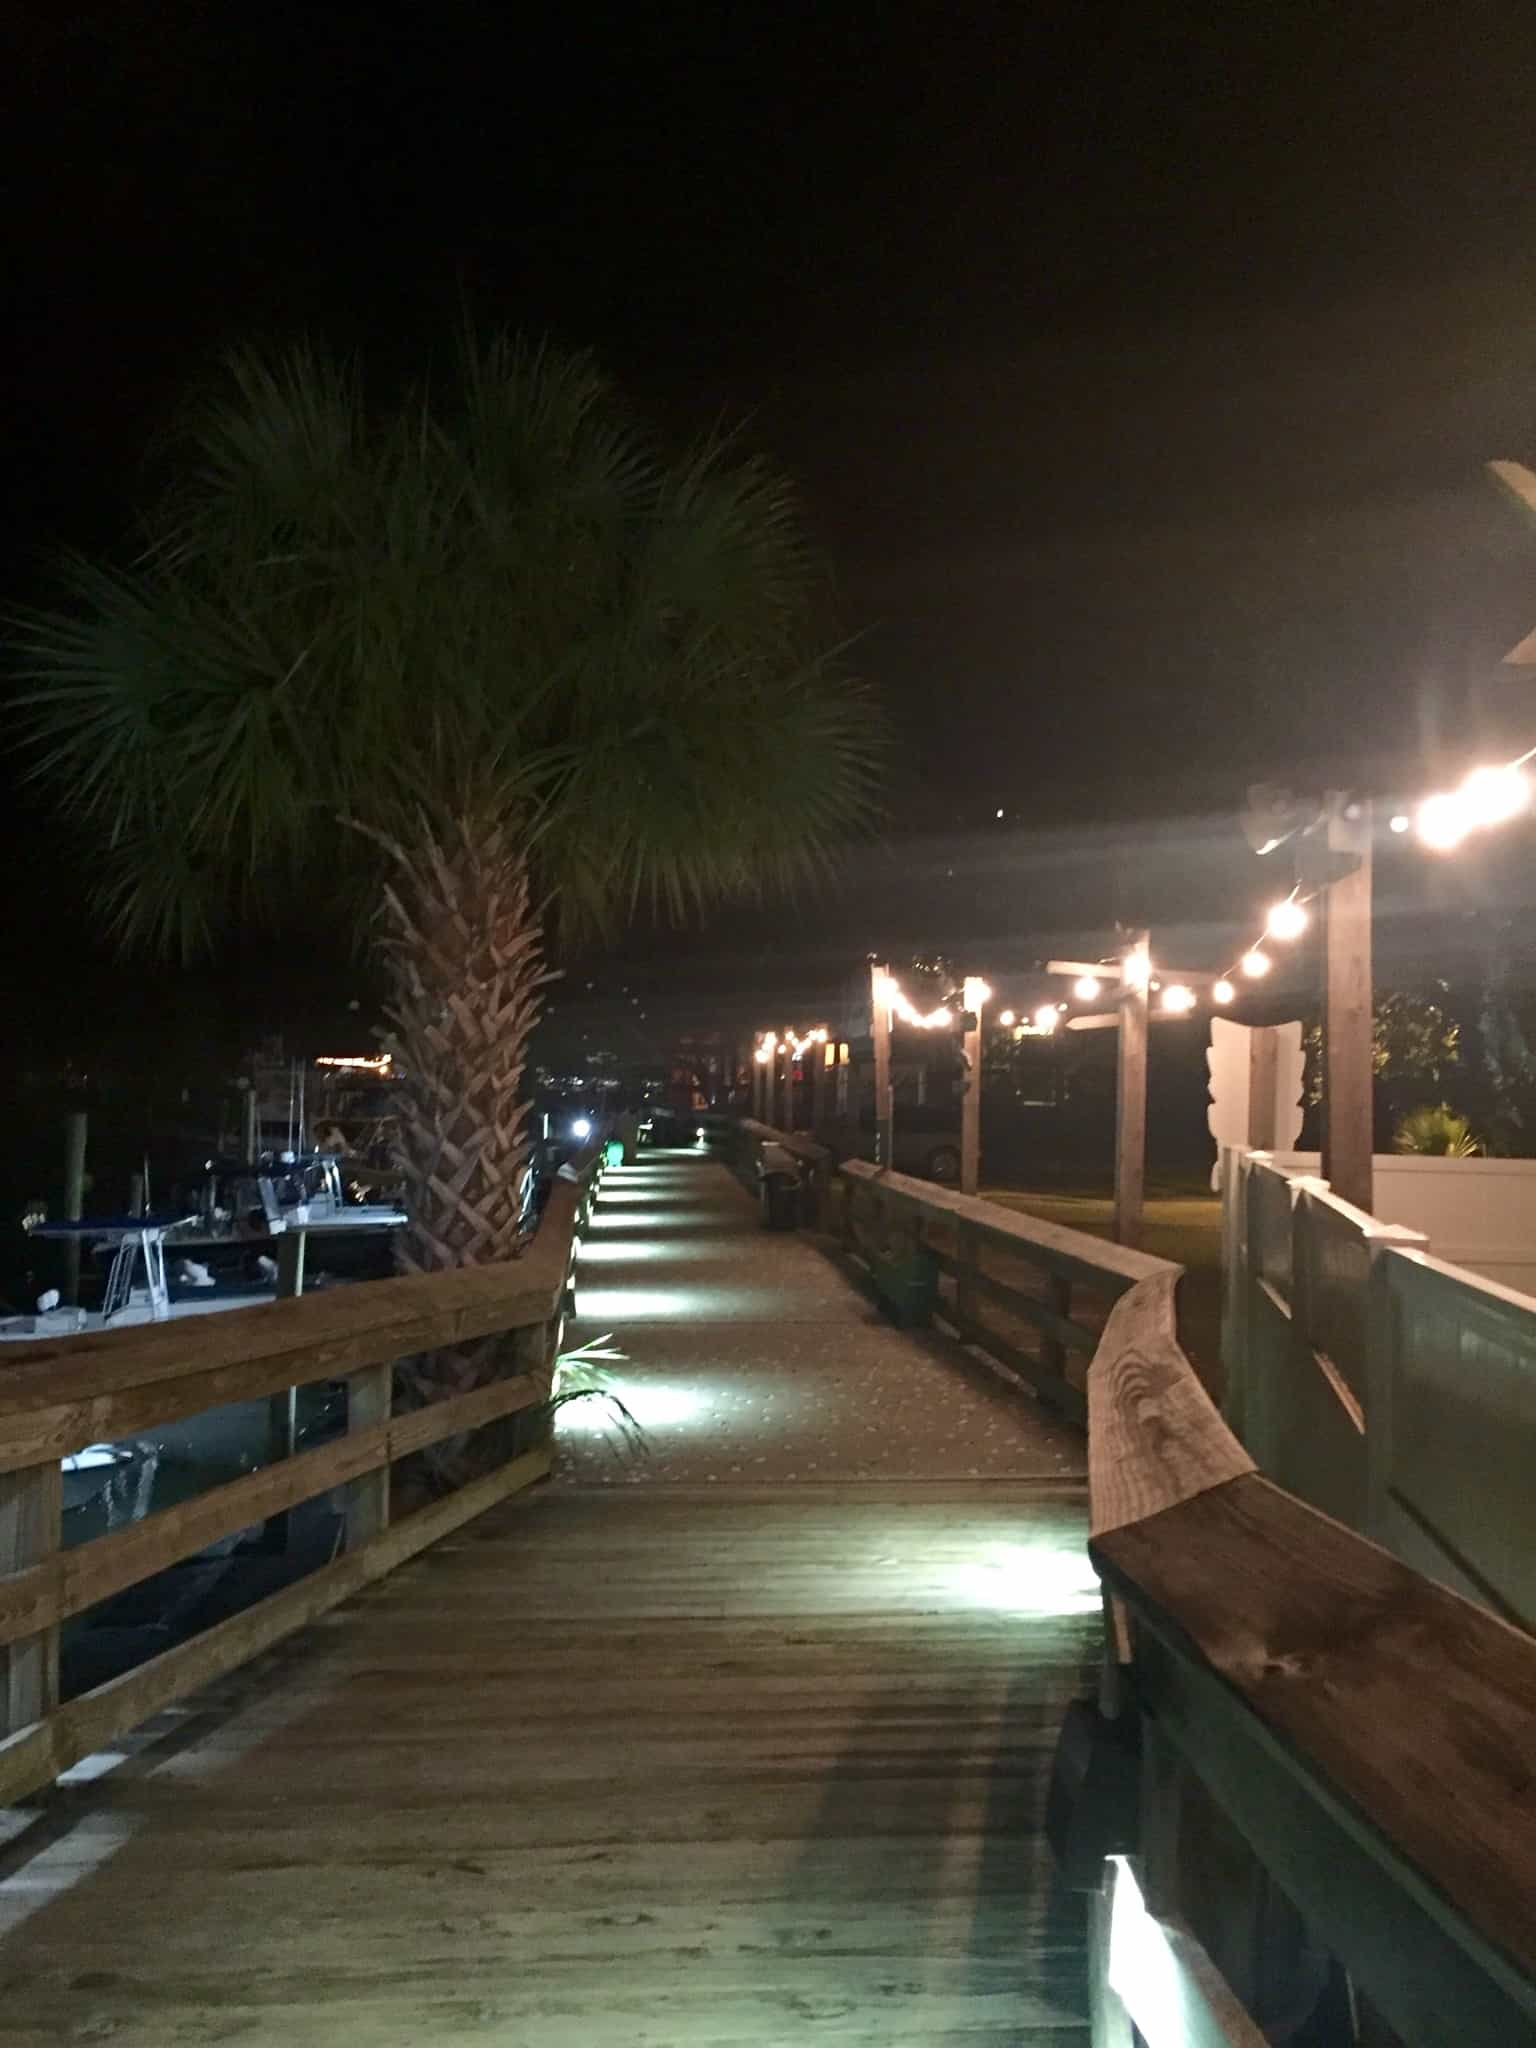 Murrell's Inlet boardwalk at night